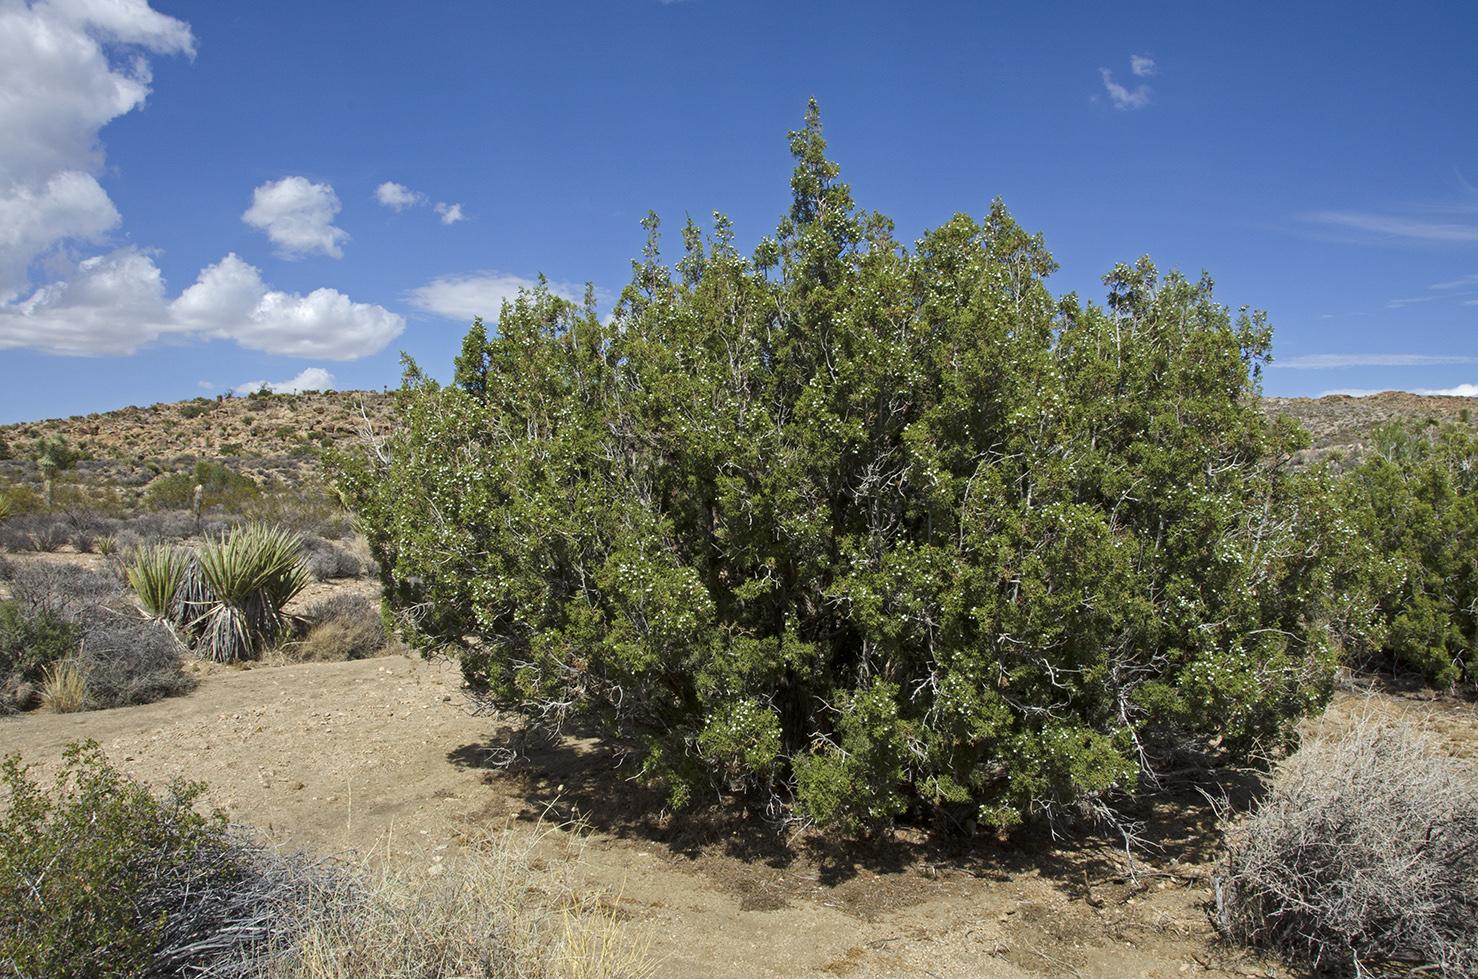 A large Juniper Tree